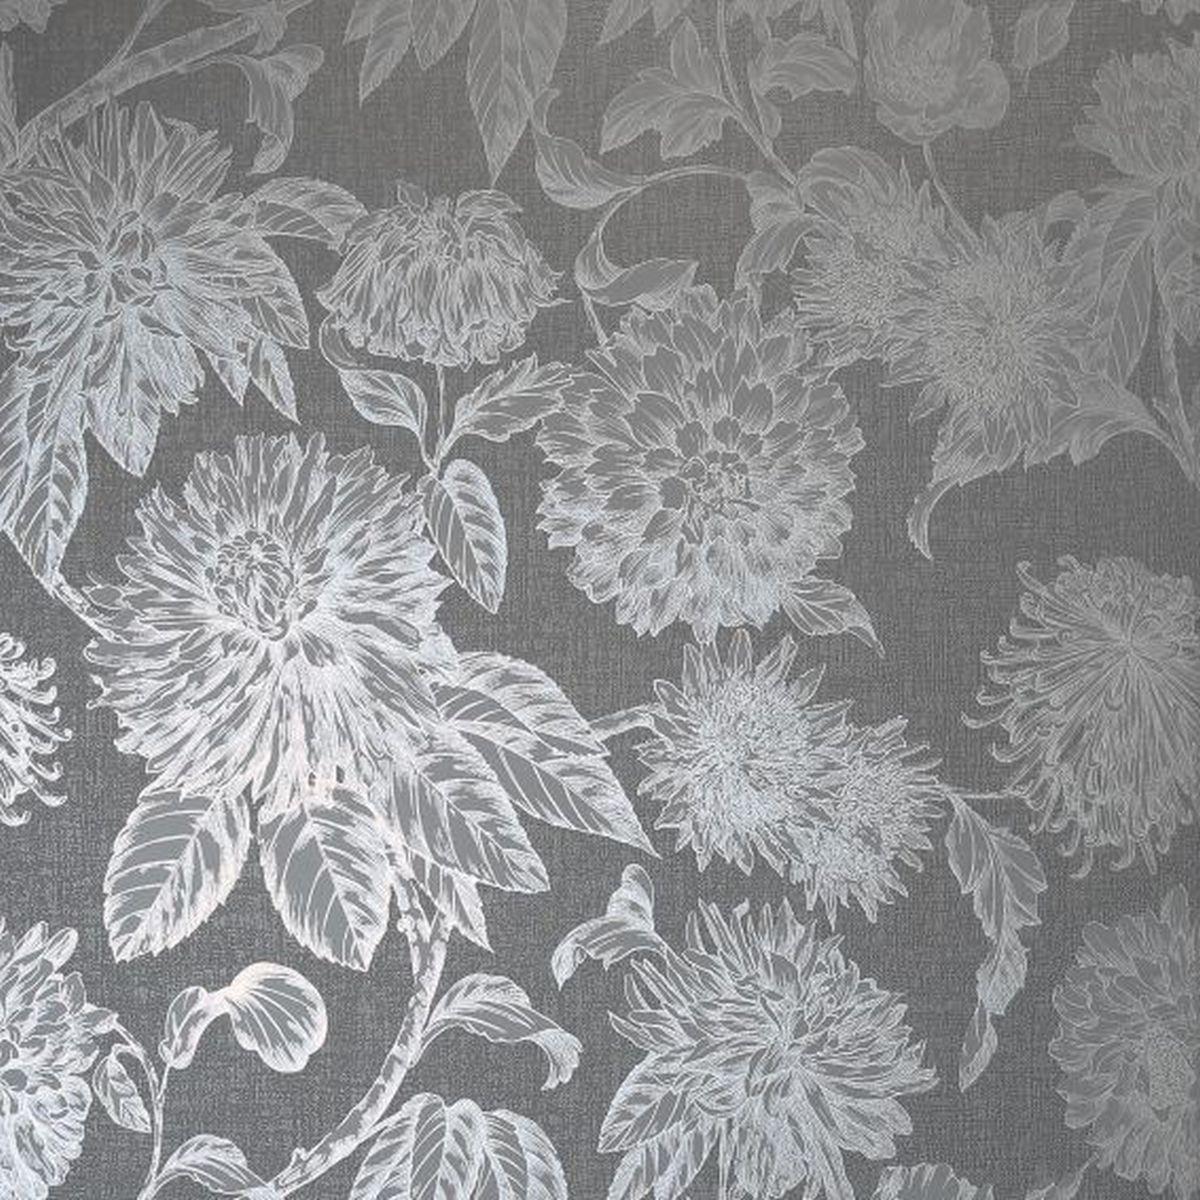 Best of Arthouse Vliestapete Edles Design 906600 Grau Blumentapete